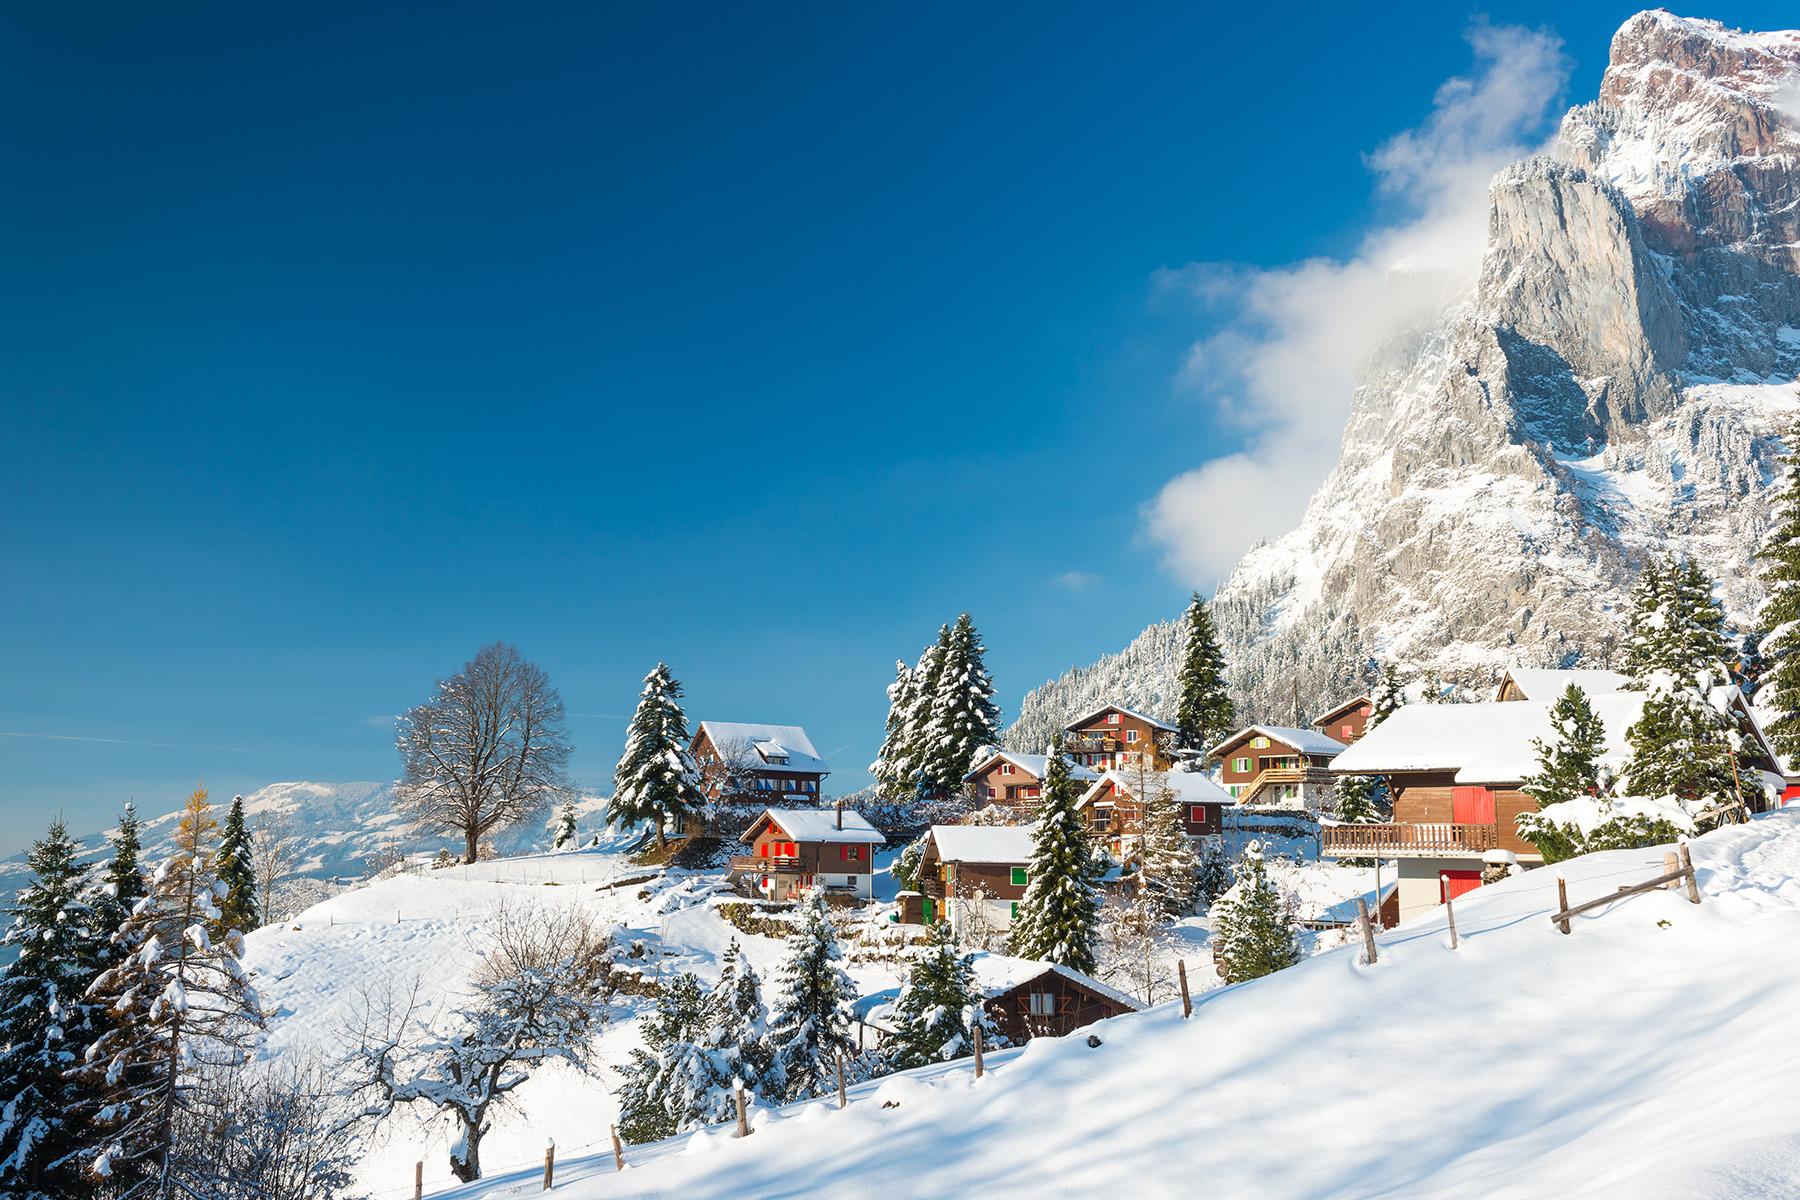 A Swiss village around Christmas